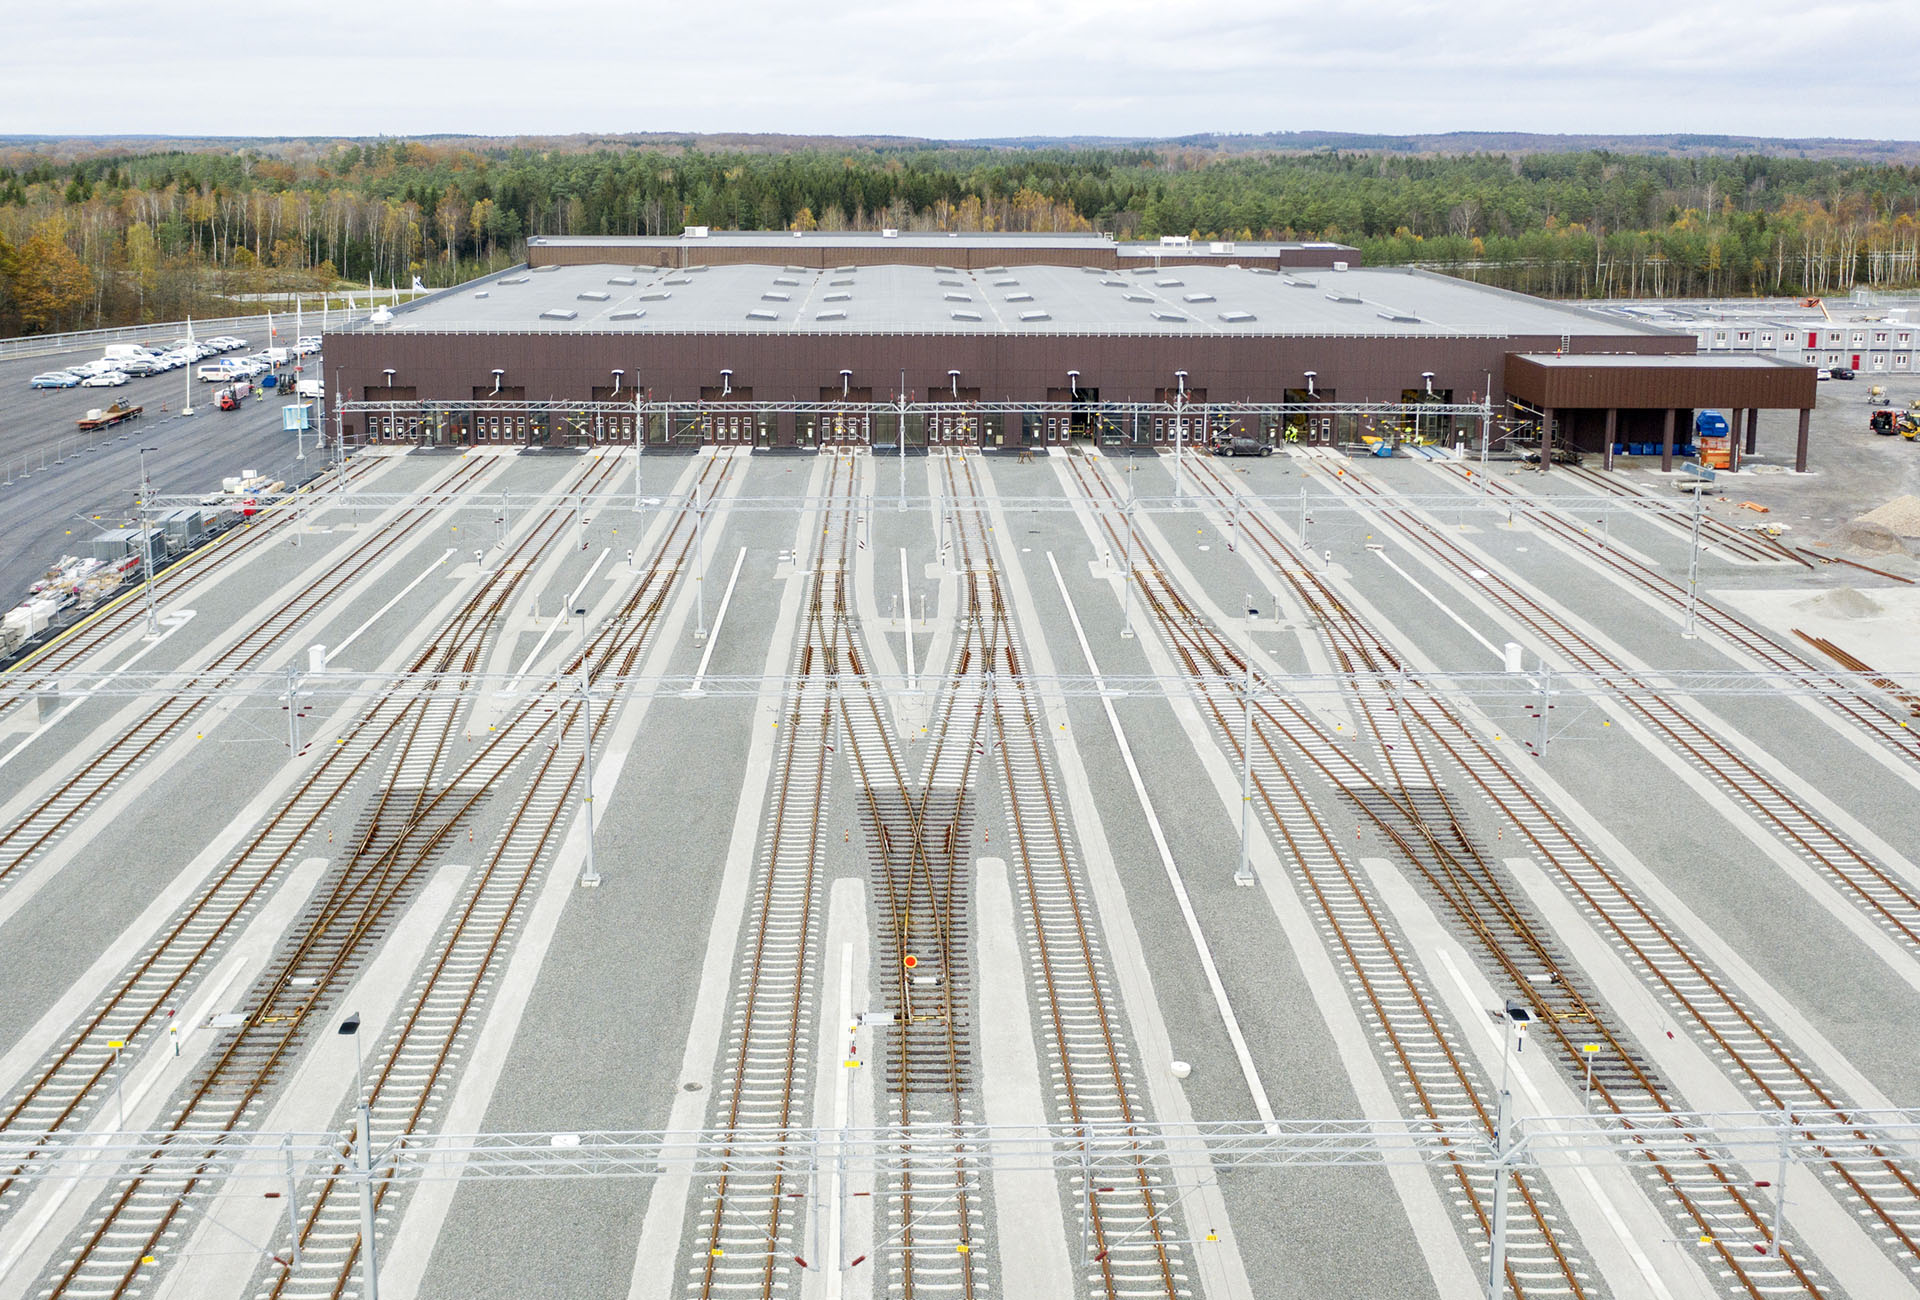 Ny tågdepå i Hässleholm